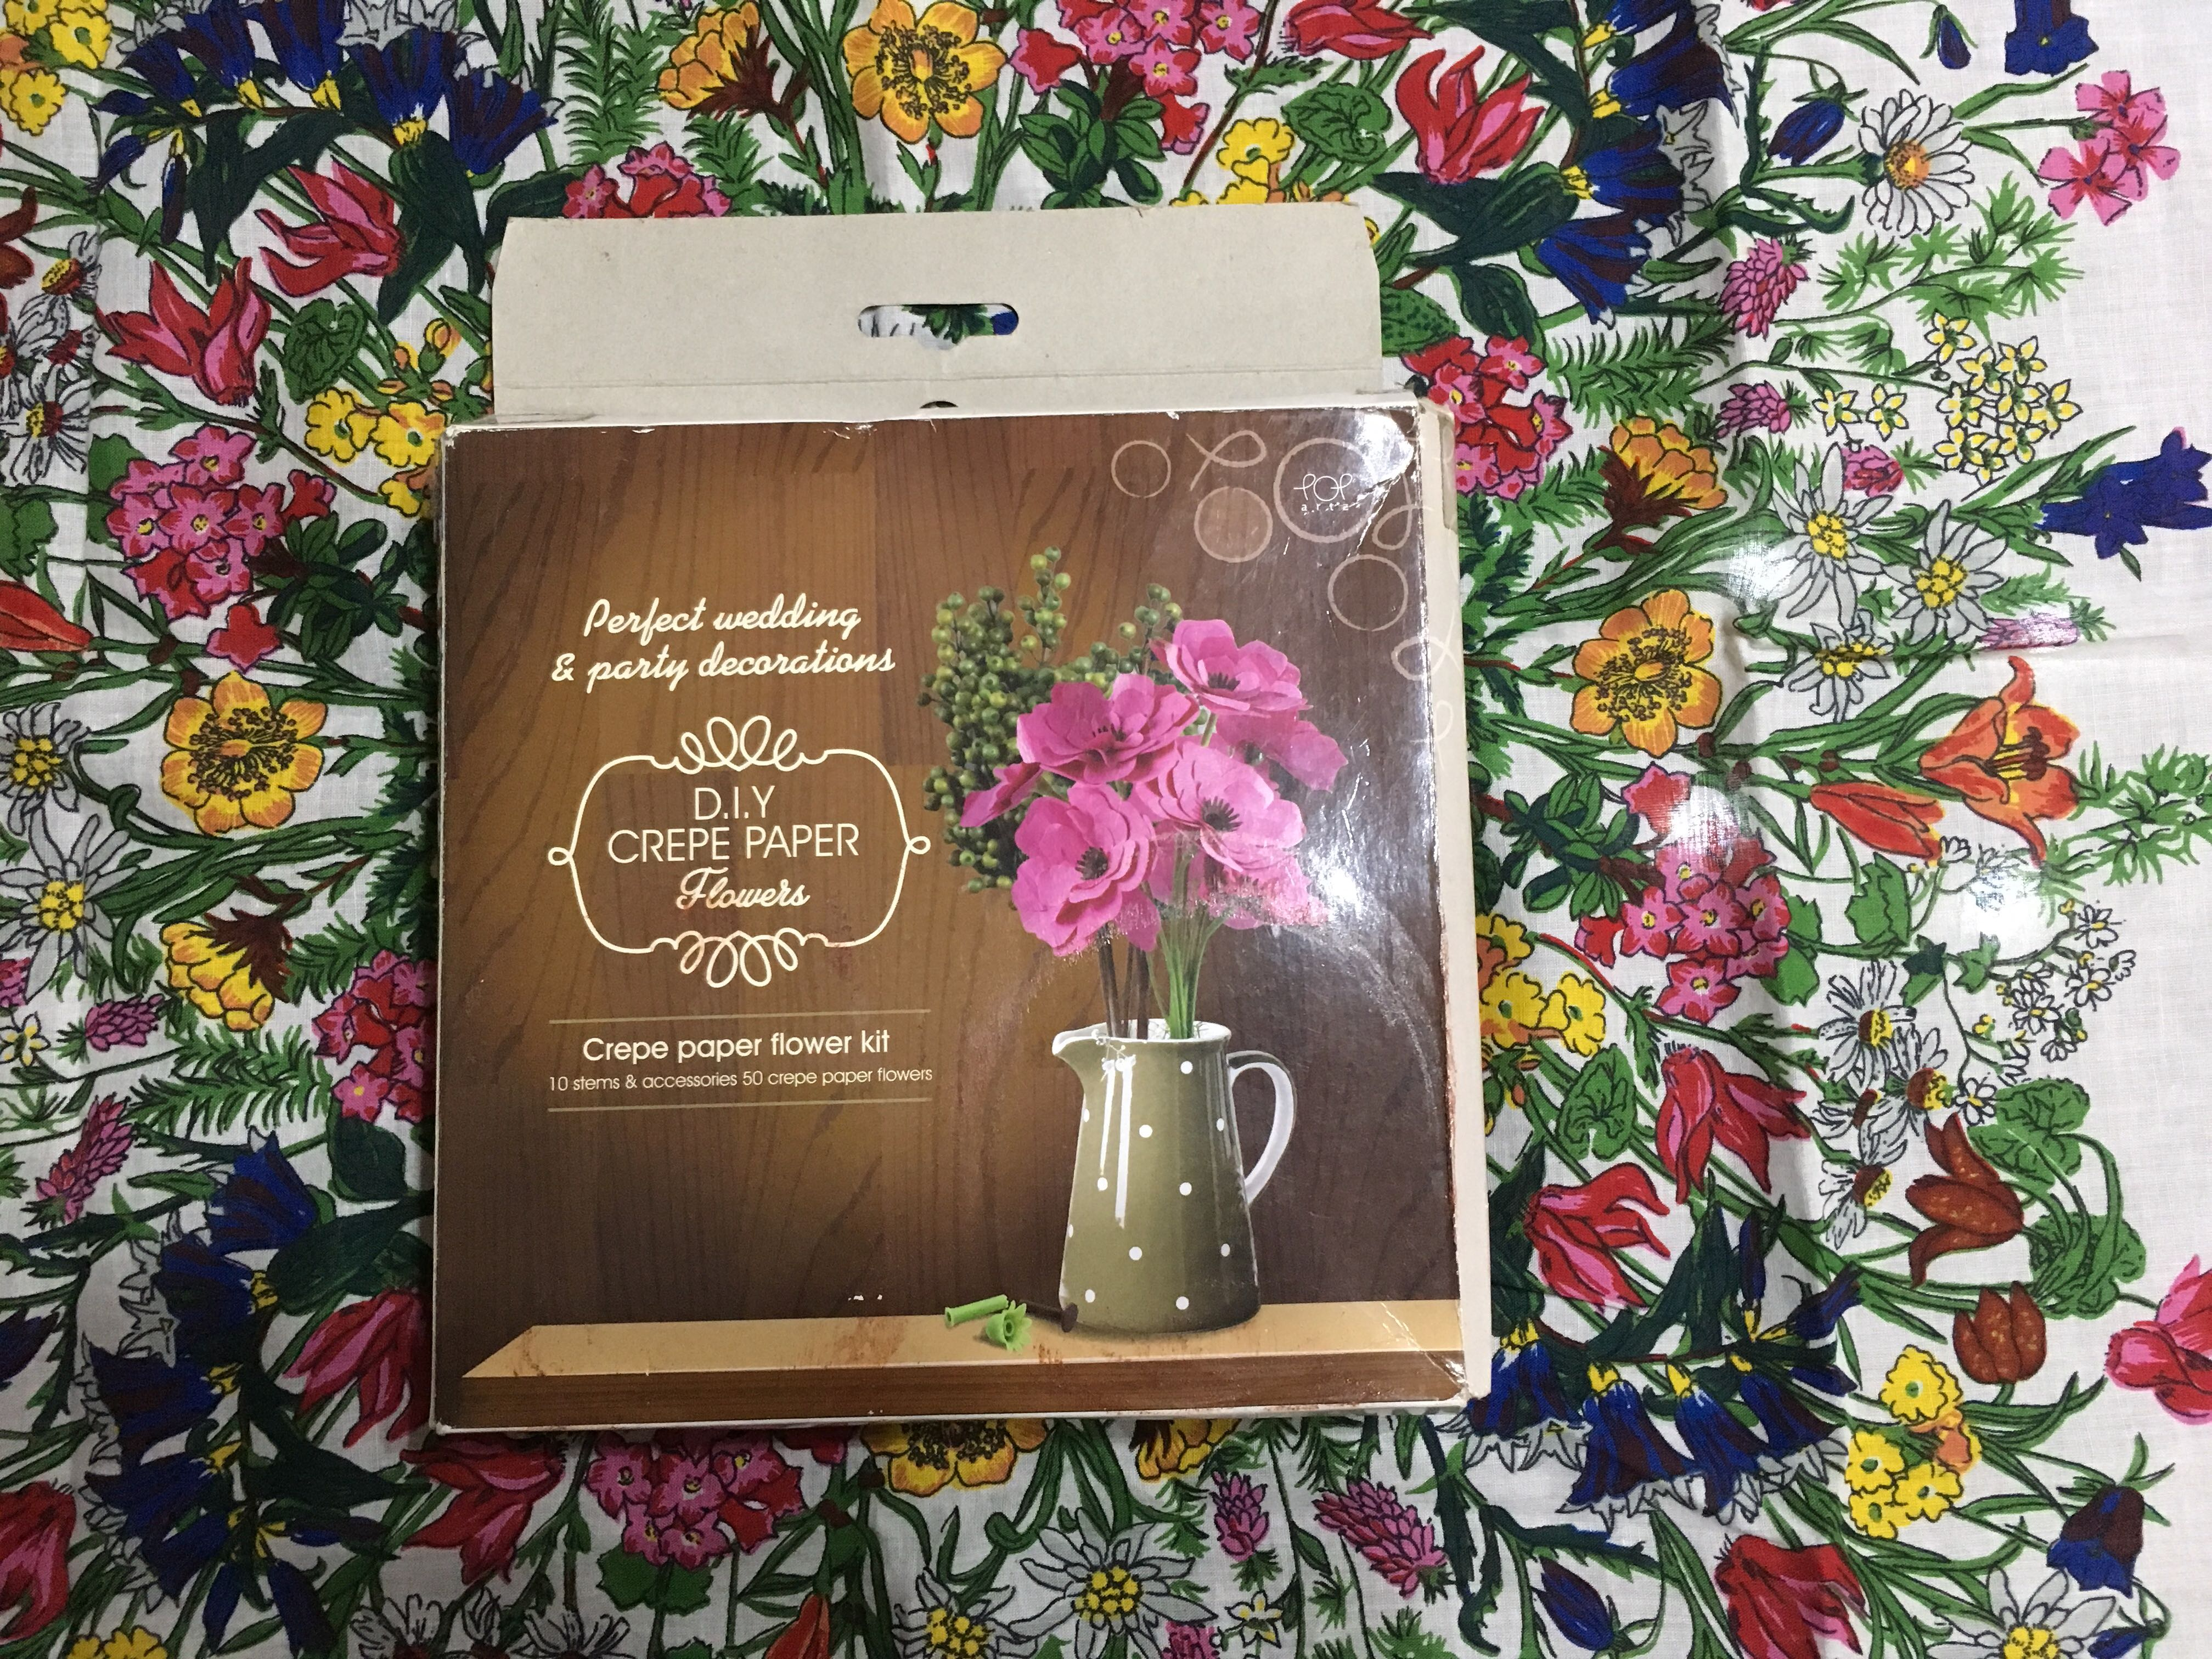 Diy Crepe Paper Flowers Blessing Design Craft Craft Supplies